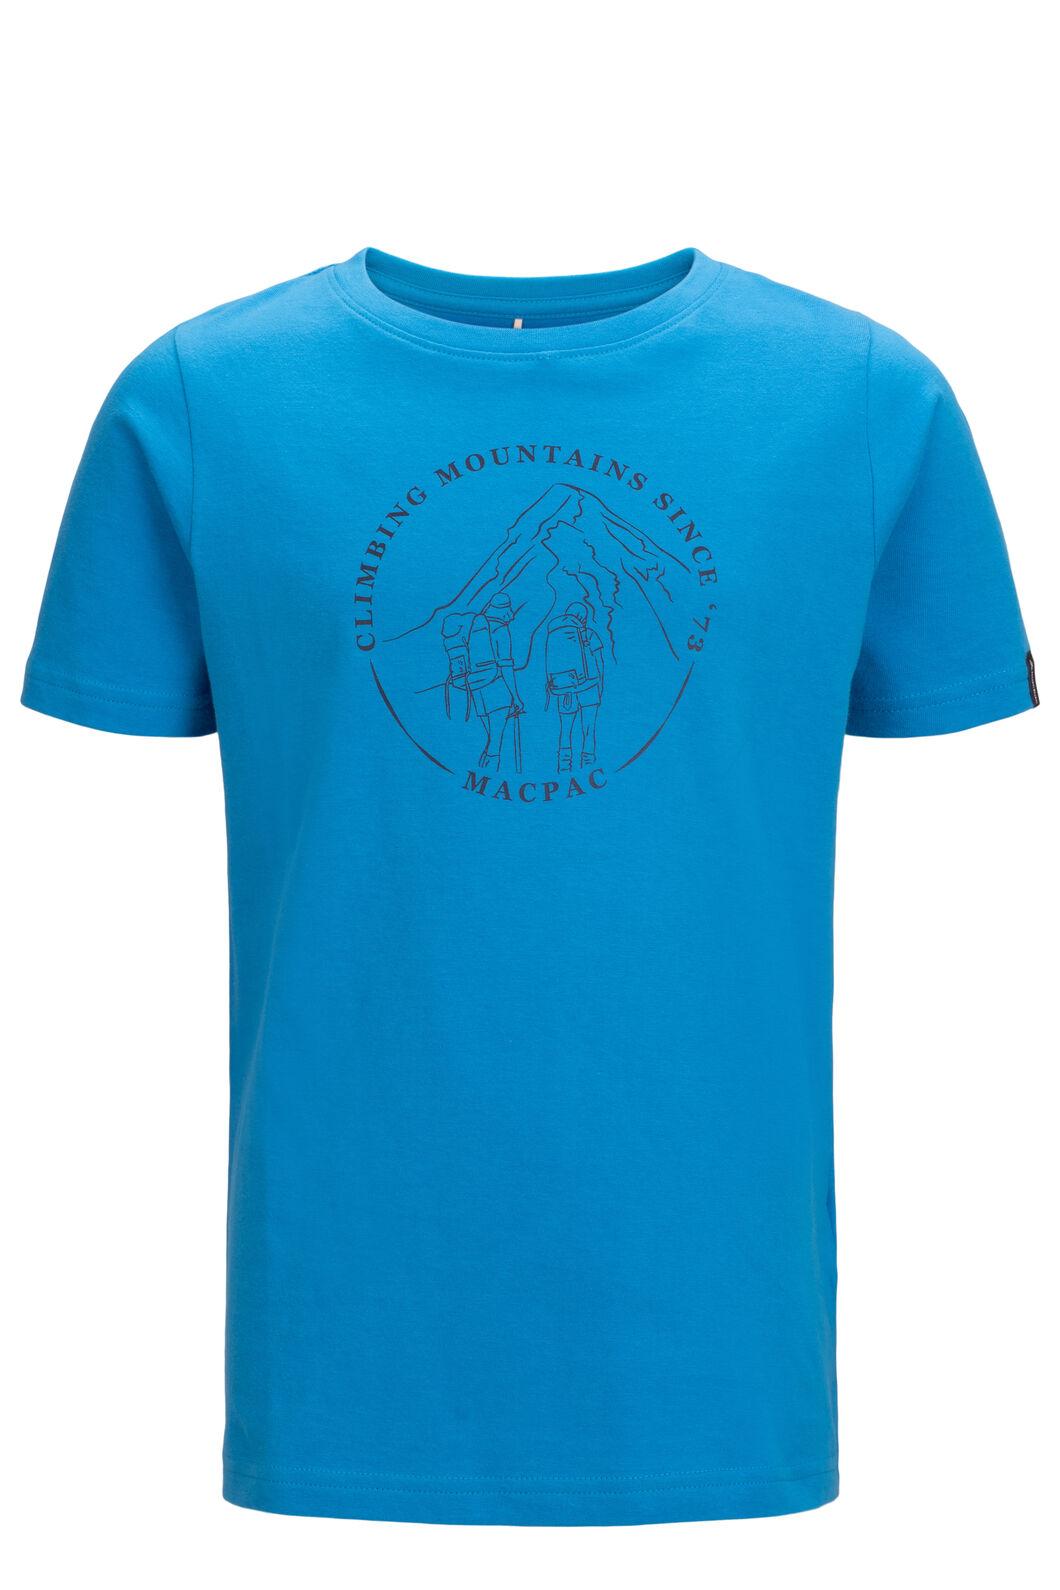 Macpac Kids' Since 1973 Fairtrade Organic Cotton Tee, Blue Aster, hi-res